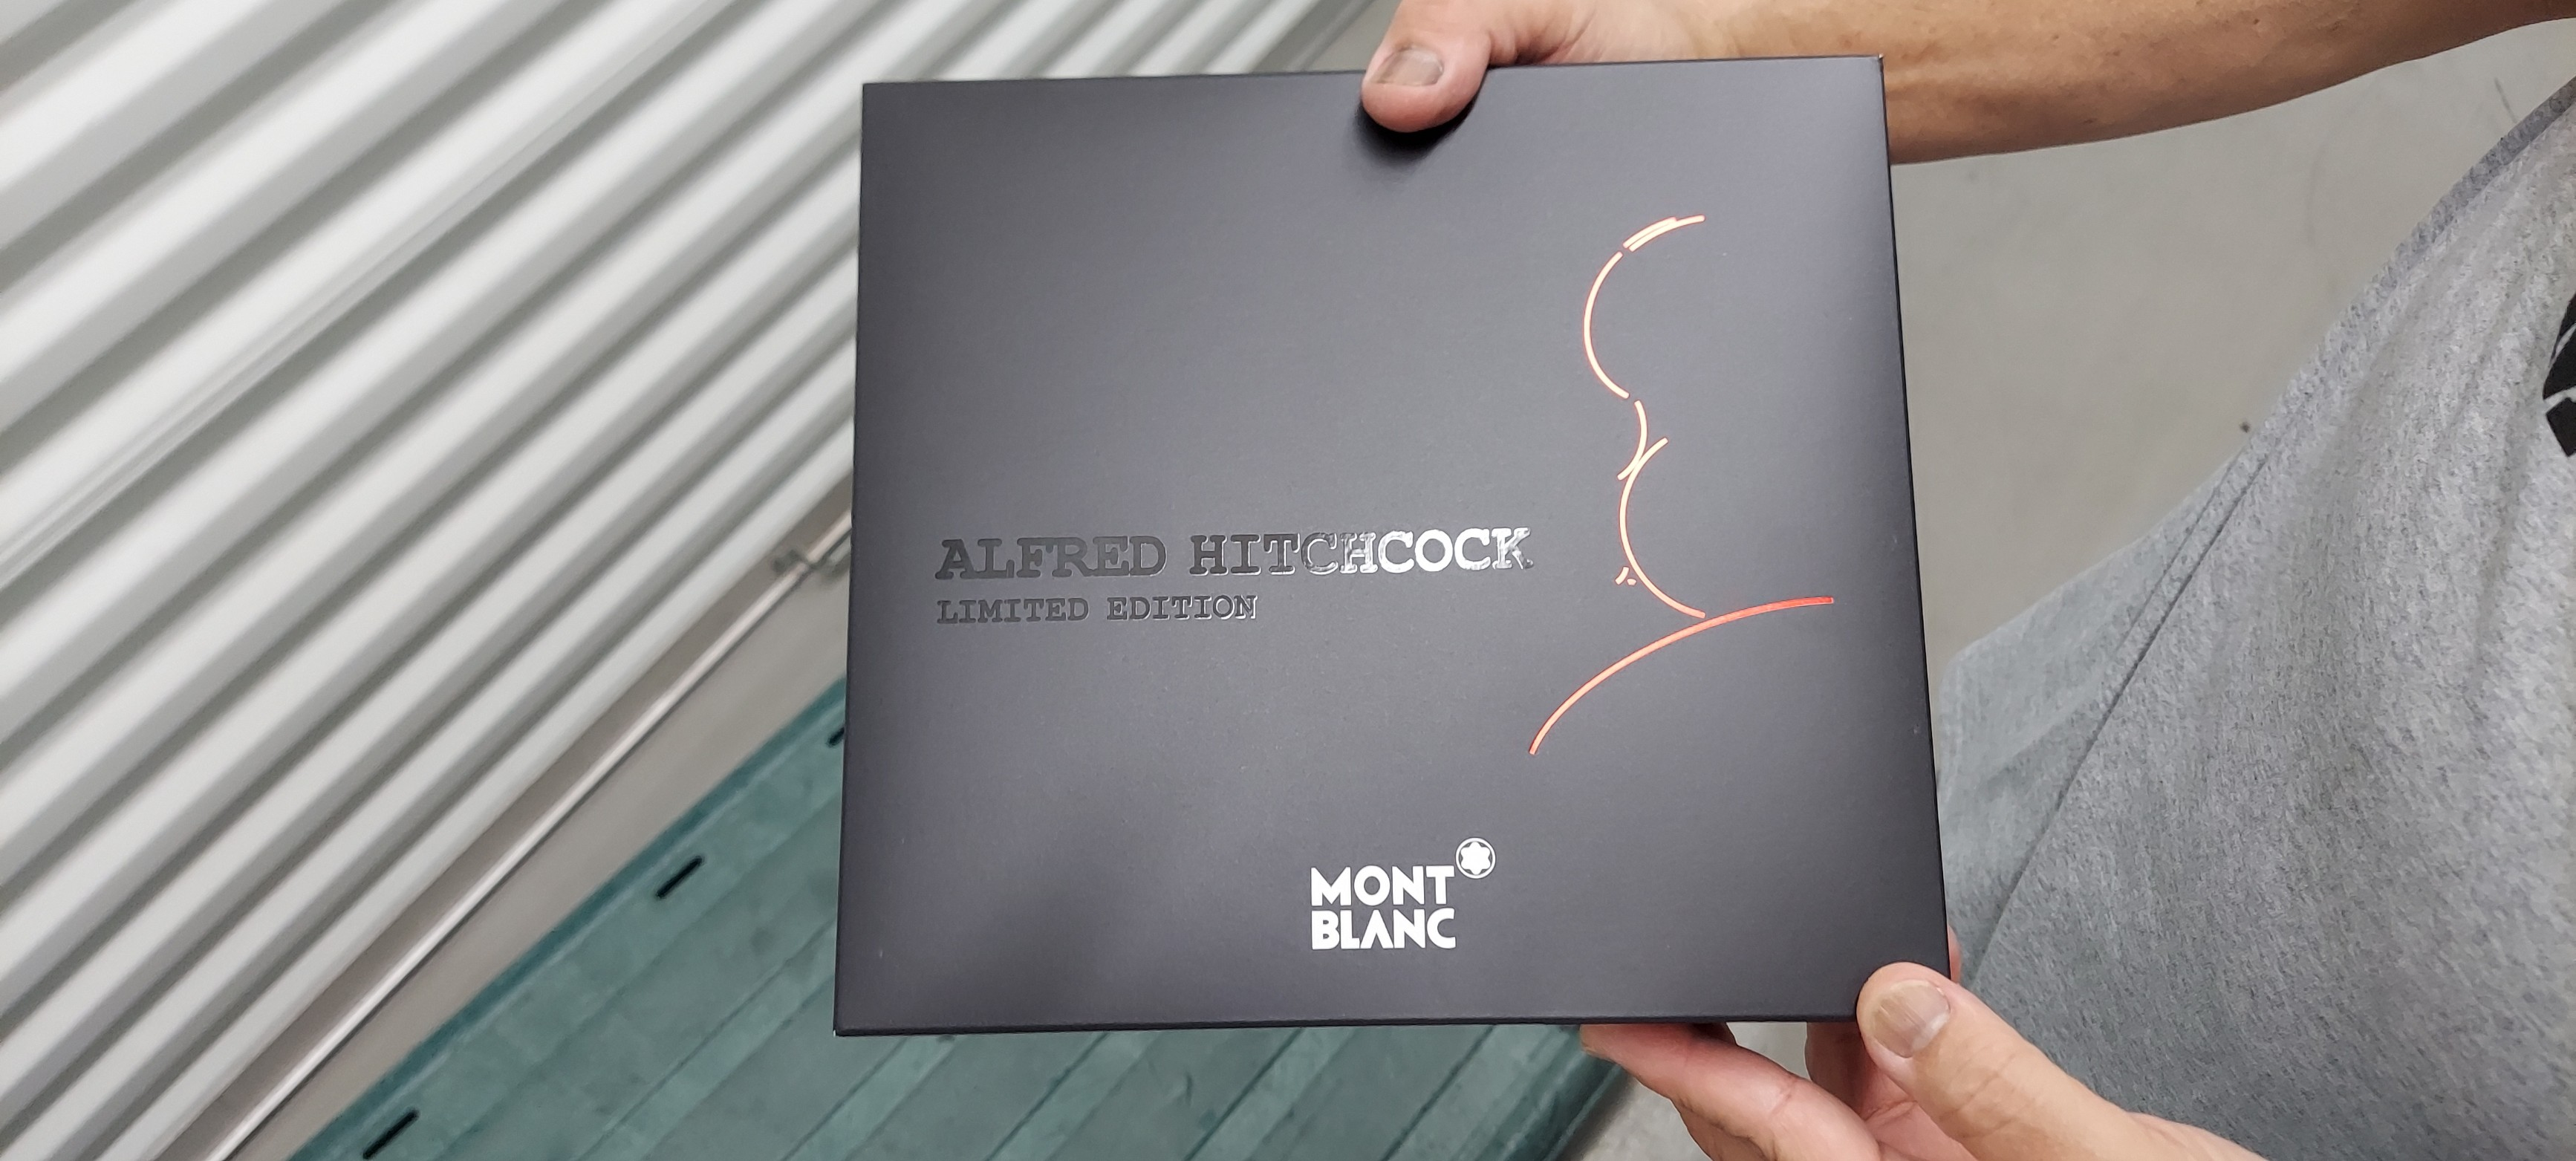 Pens and Pencils: : Mont Blanc: M28800